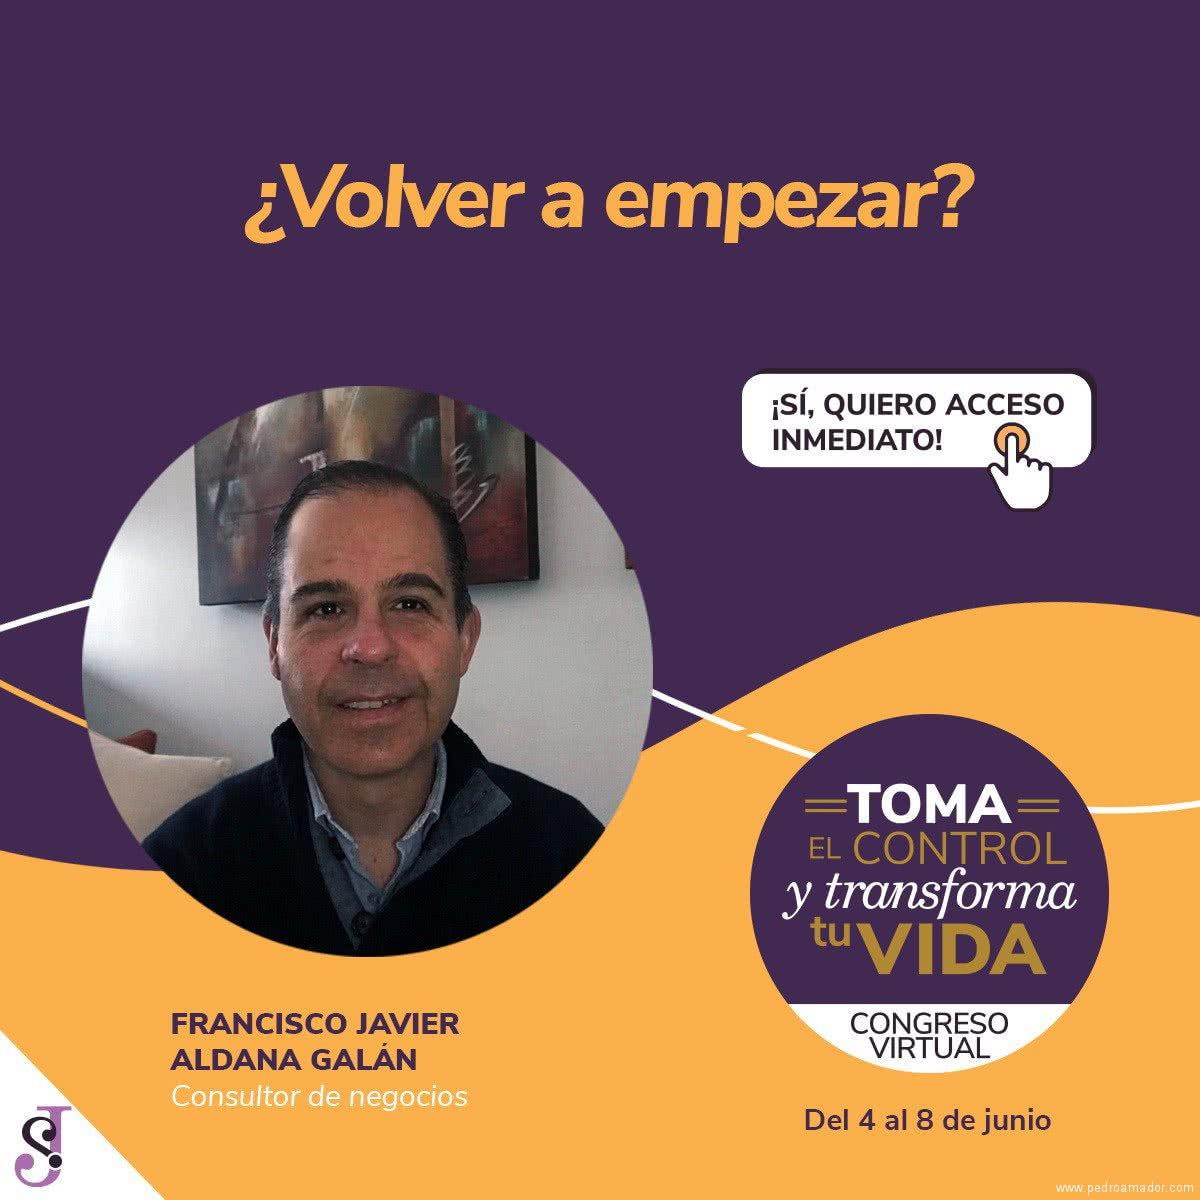 Transforma tu vida - Francisco Javier Aldana Galán